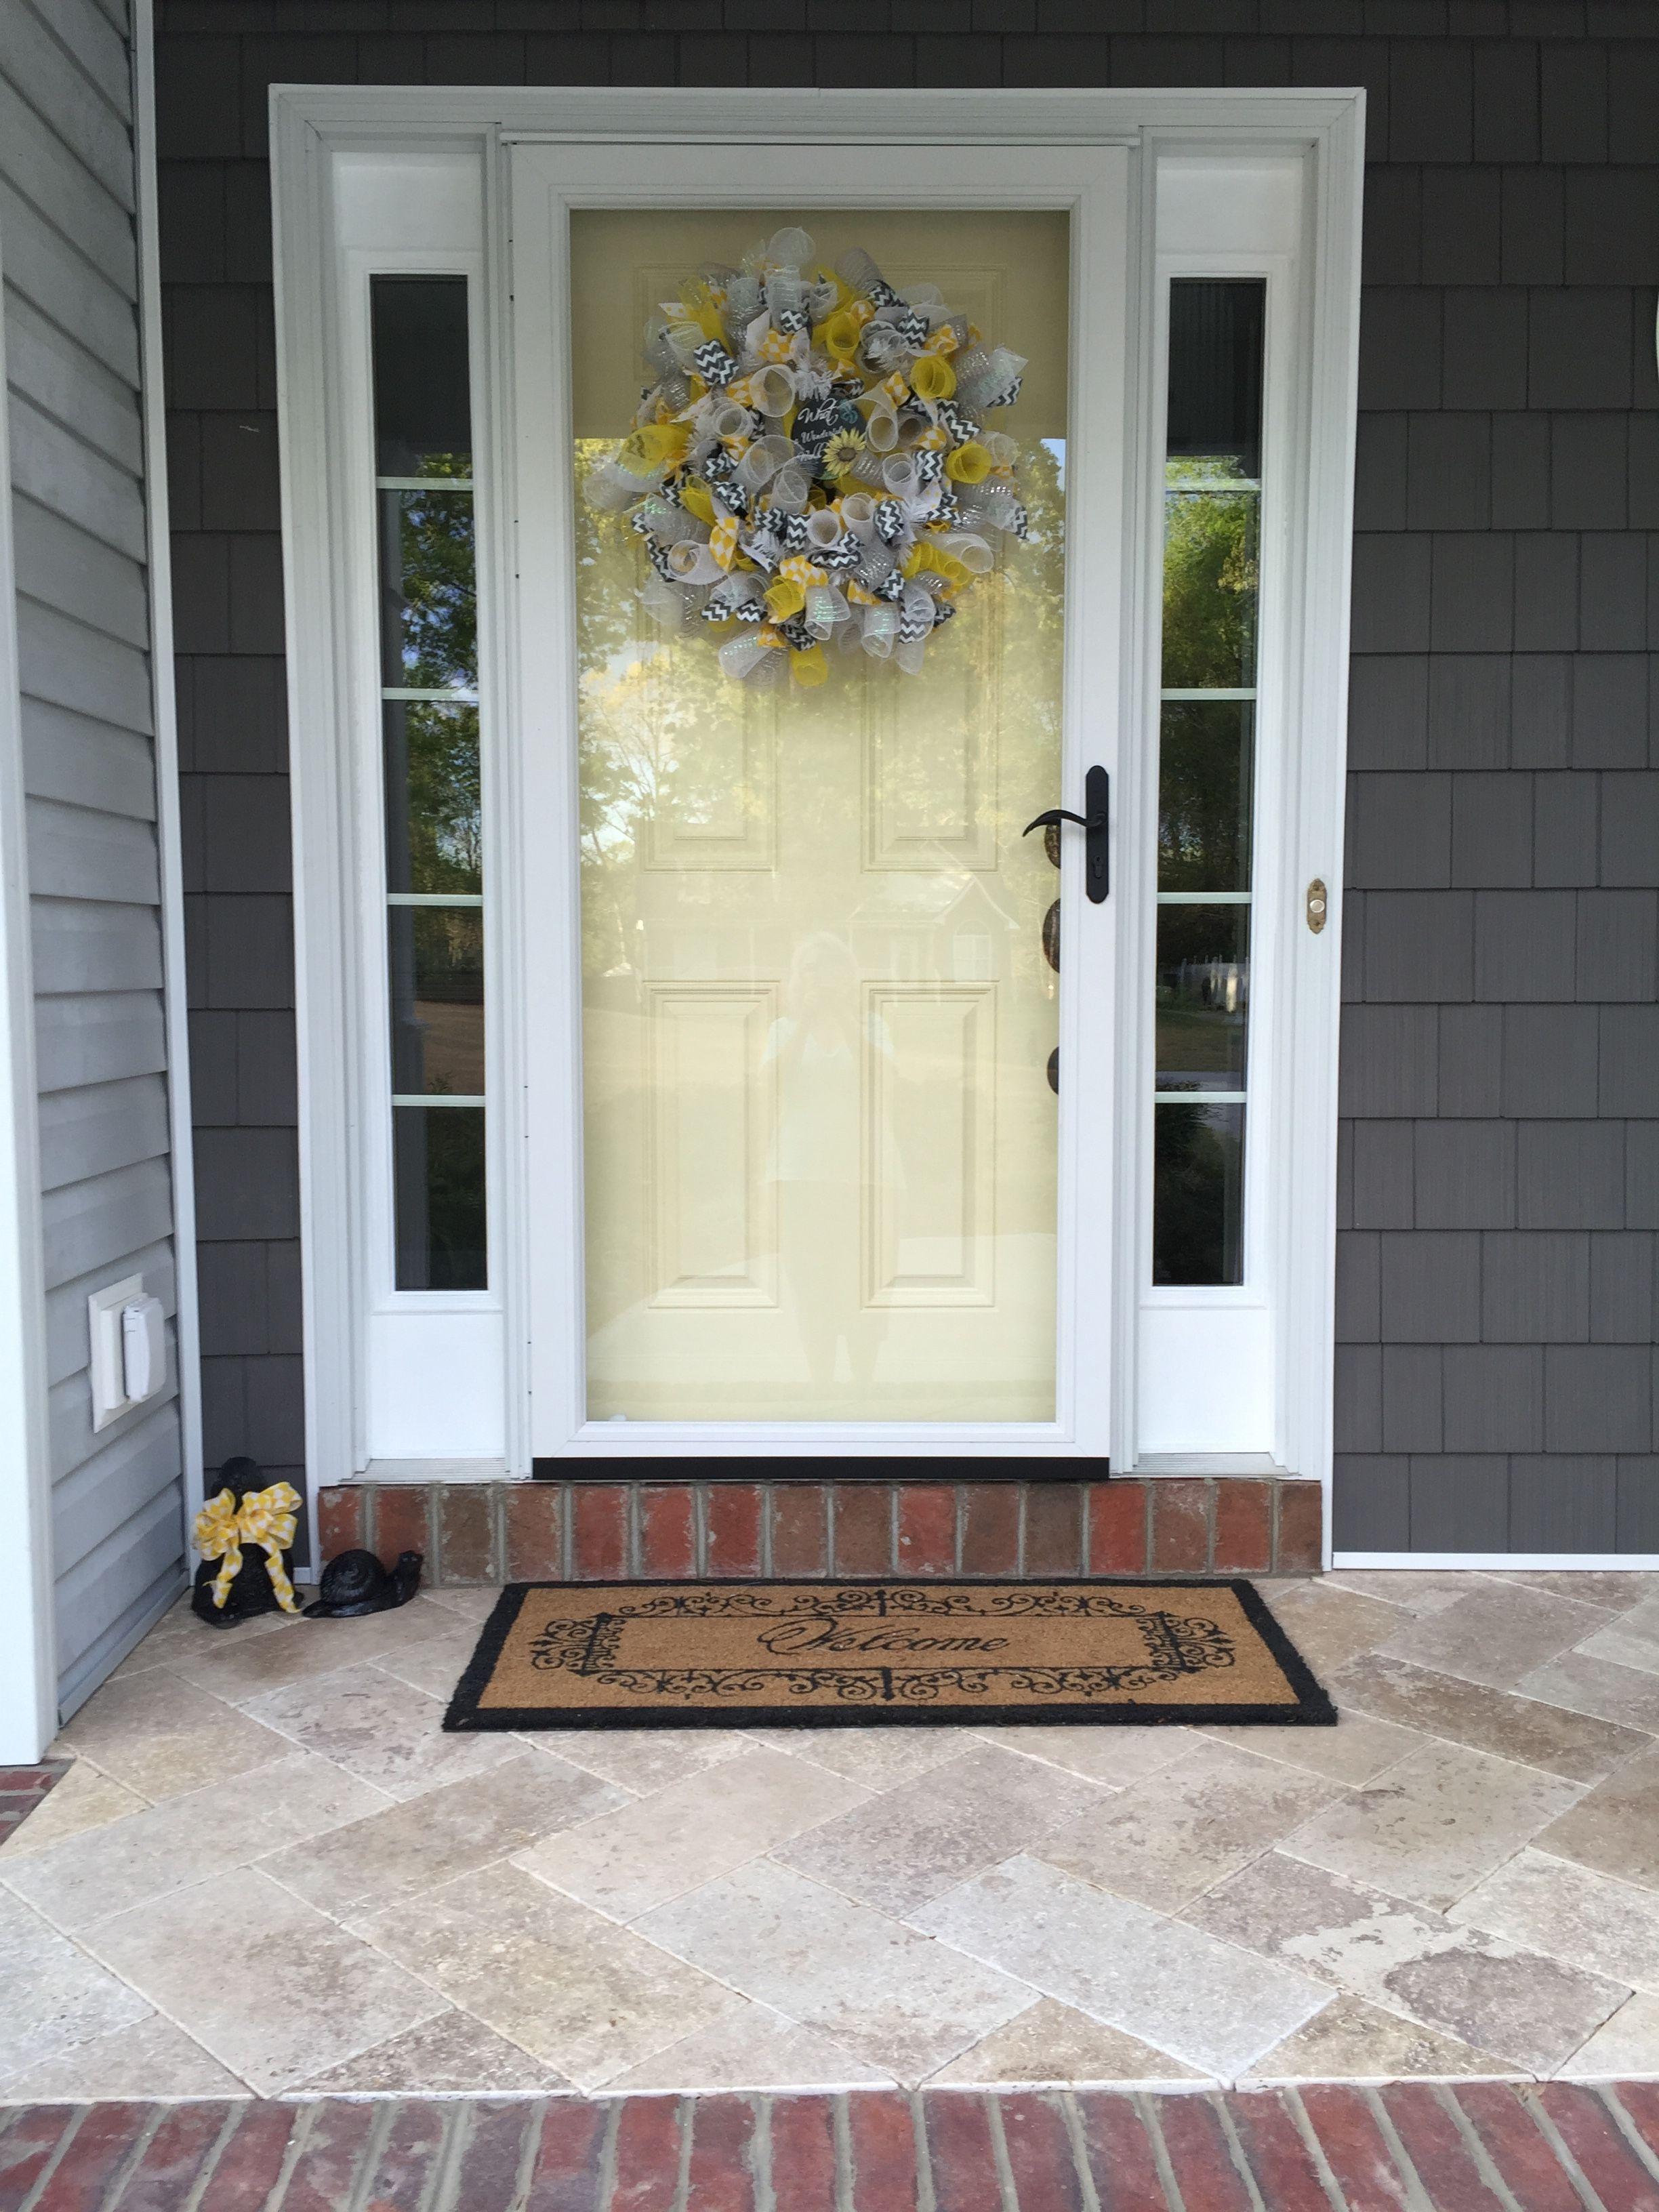 Outdoor Tile For Front Porch   Shapeyourminds.com